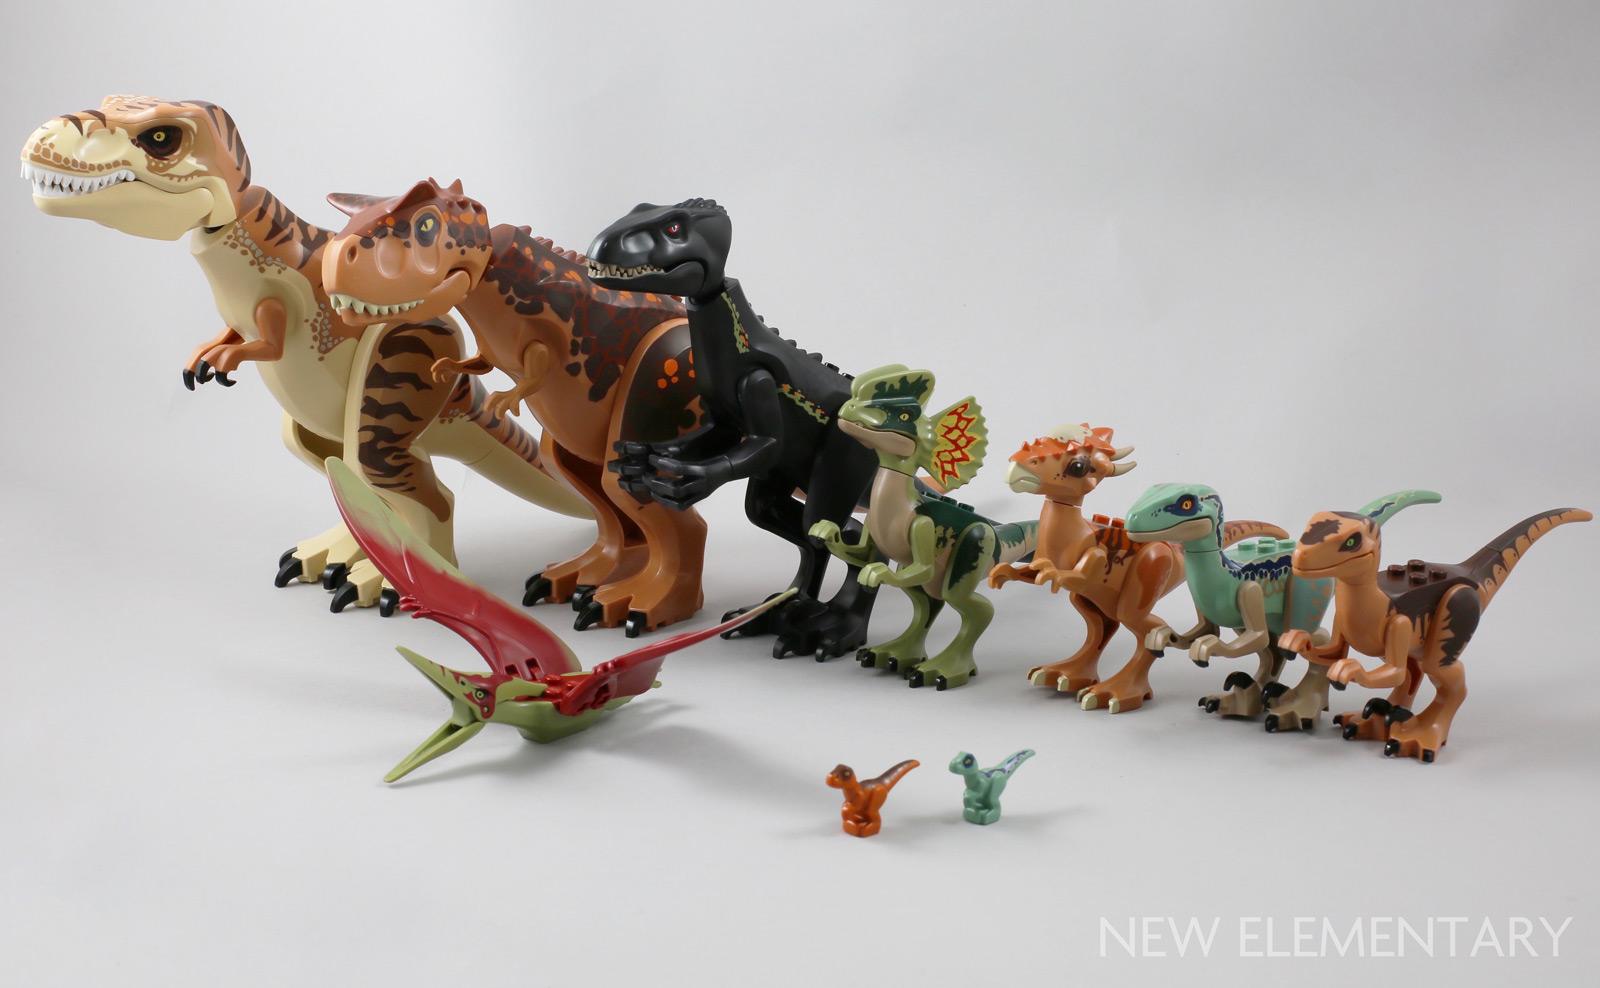 New elementary a lego blog of parts - Lego dinosaurs spinosaurus ...